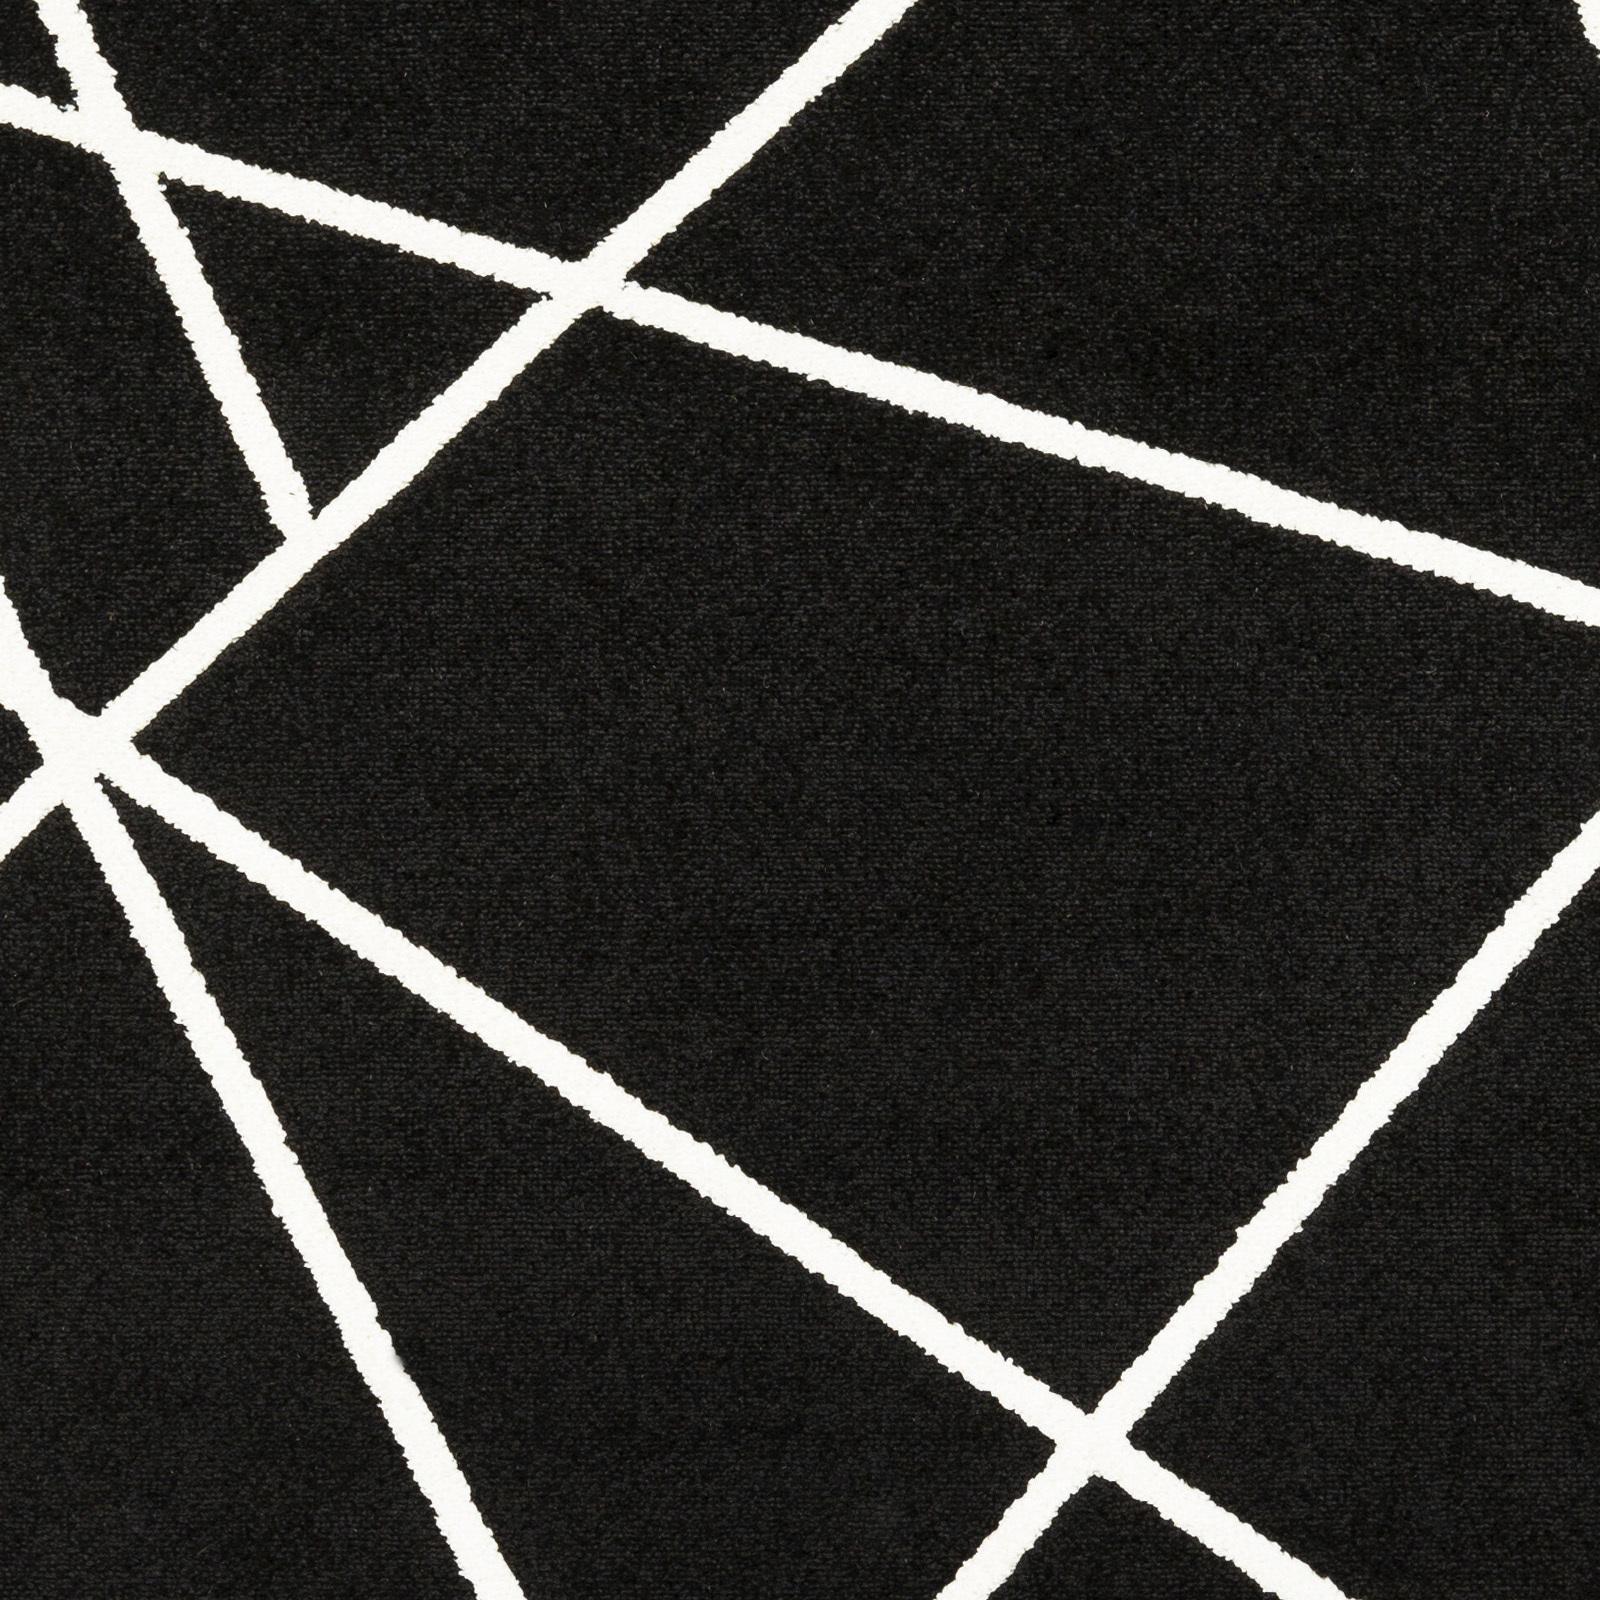 Horizon - 2' x 3' Area Rug